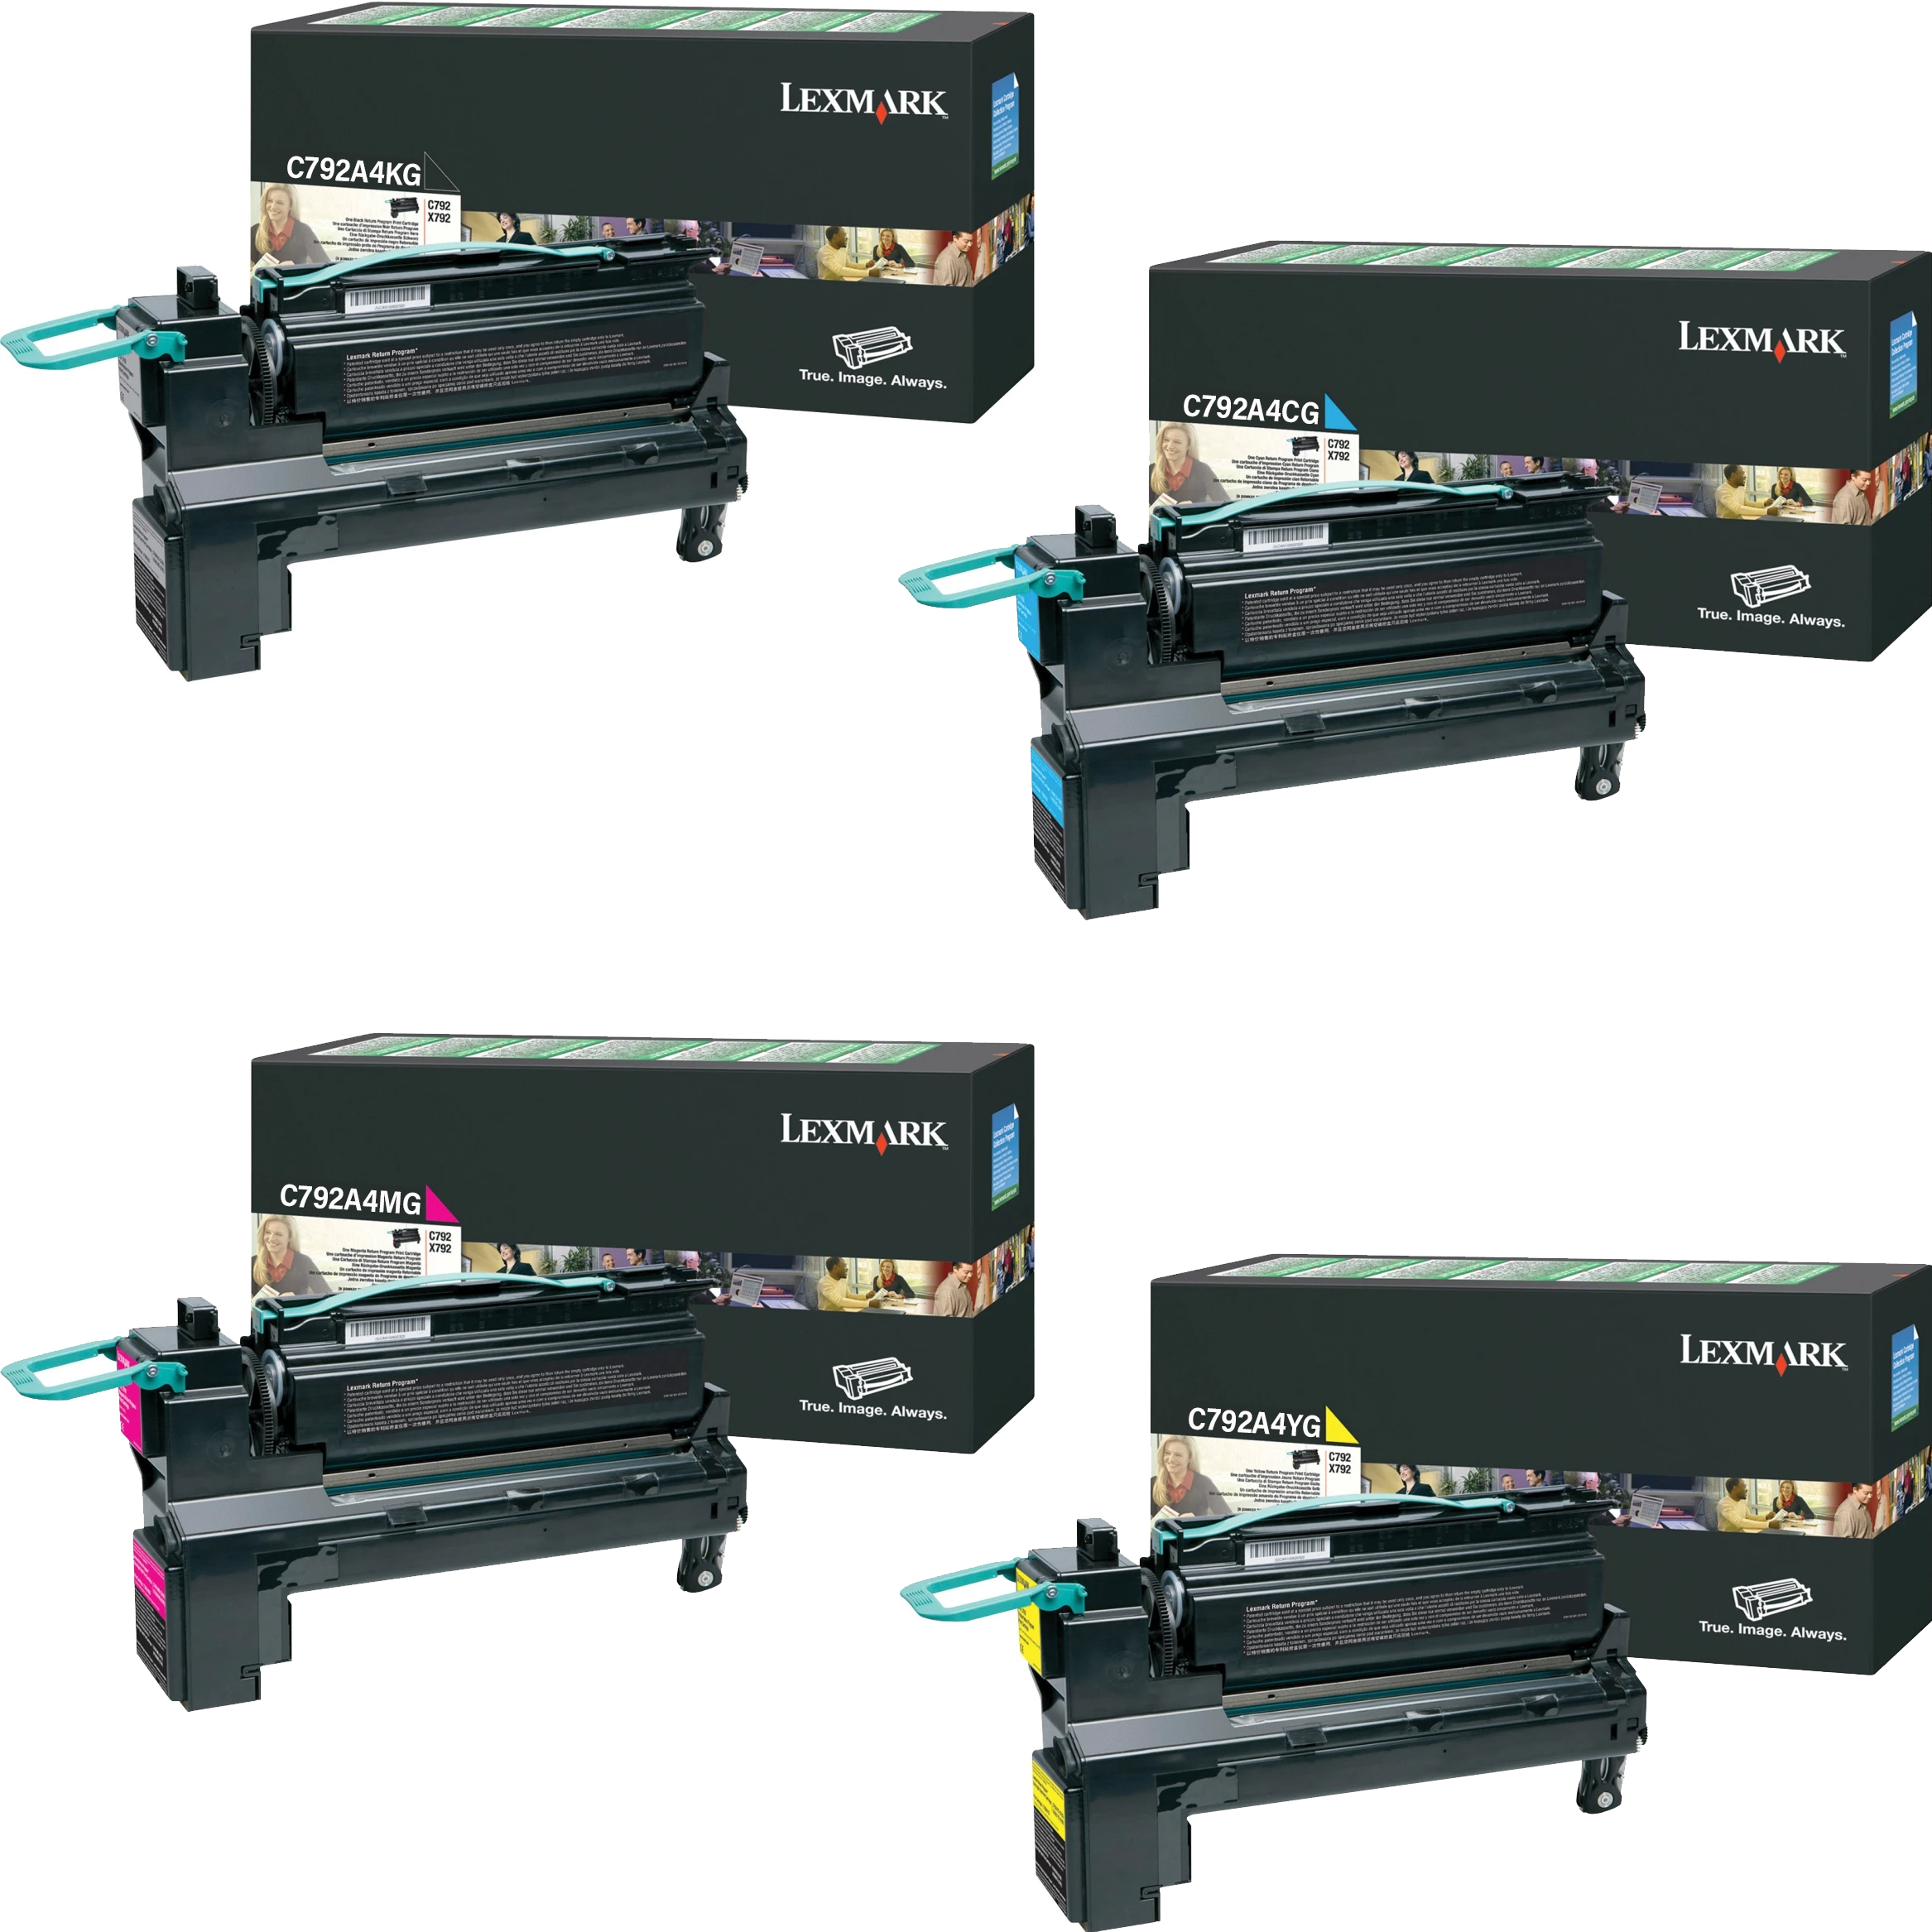 Lexmark C792A4 Set | C792A4CG C792A4KG C792A4MG C792A4YG | Original Lexmark Toner Cartridges – Black, Cyan, Magenta, Yellow